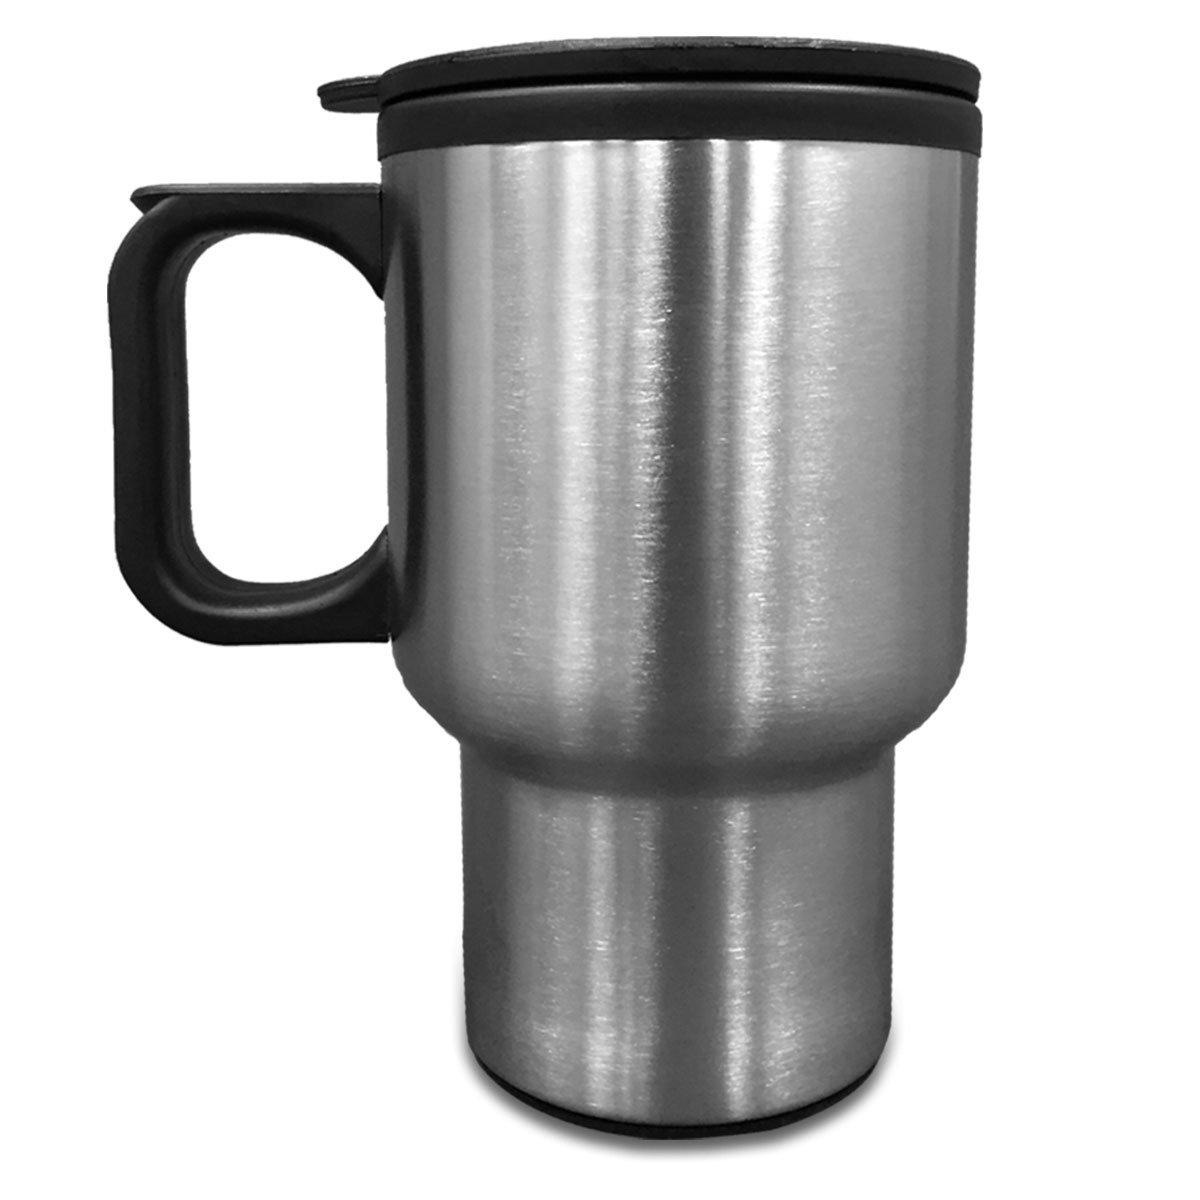 WHICH COFFEE MUG TO CHOOSE 2